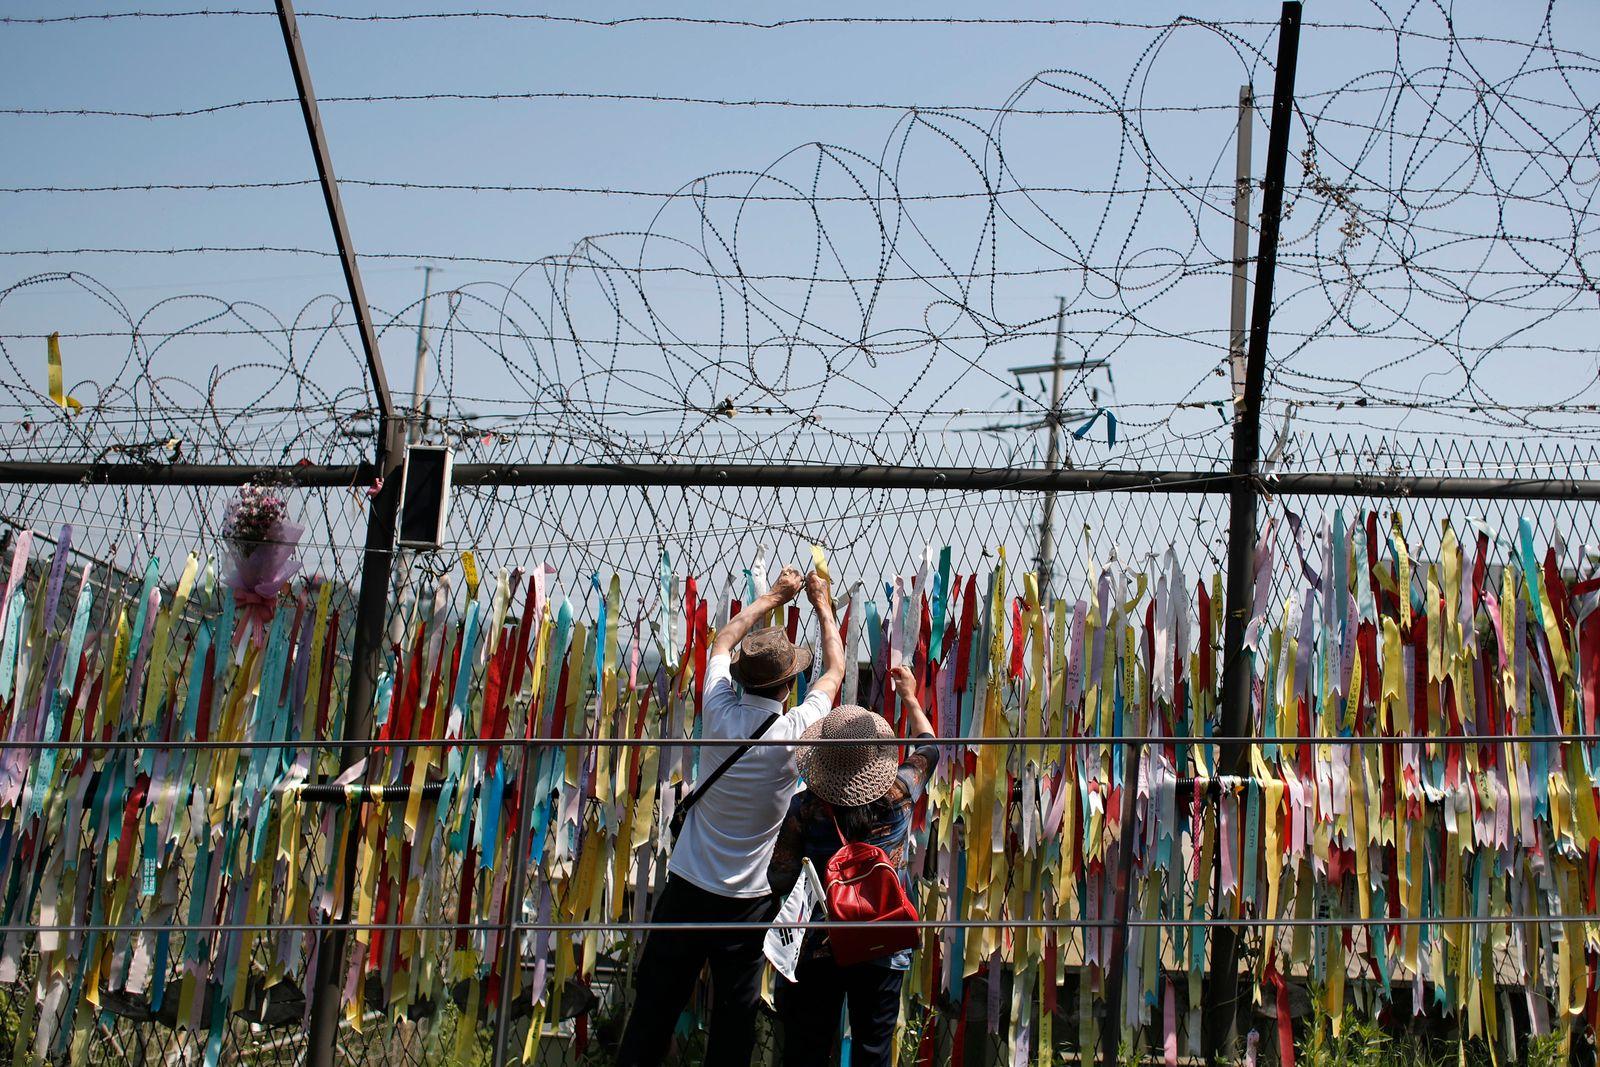 Nordkorea will Kommunikationsverbindungen zu Südkorea kappen